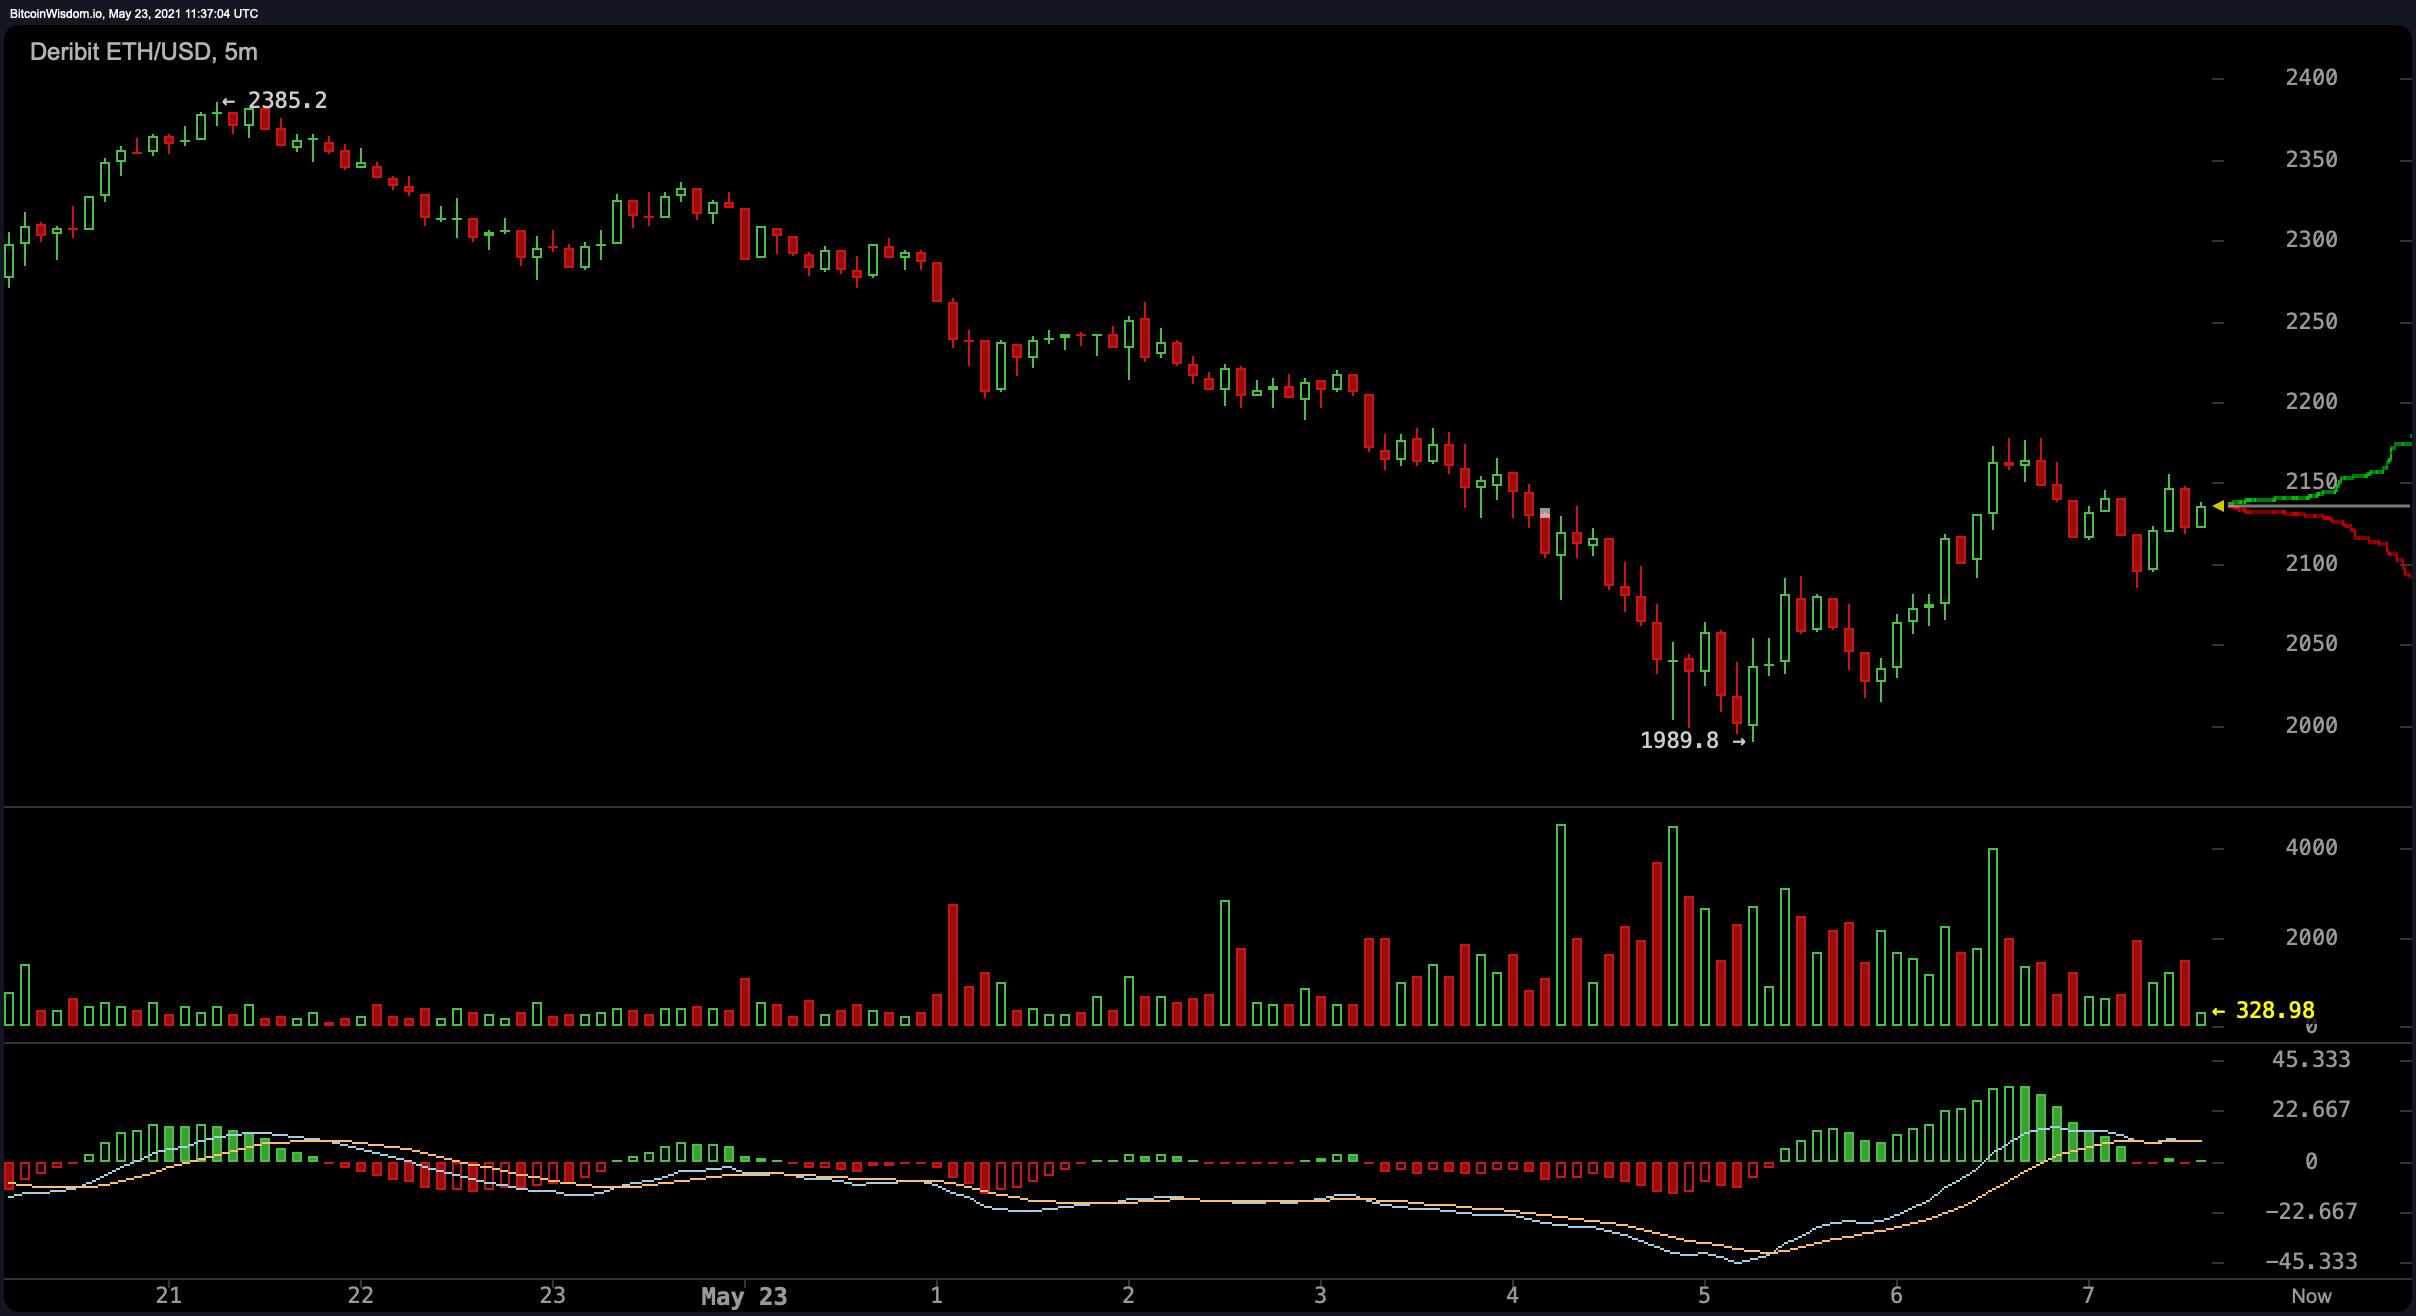 Crypto Markets Lose Billions, Weak Hands Capitulate, Stablecoin Market Surpasses $100 Billion